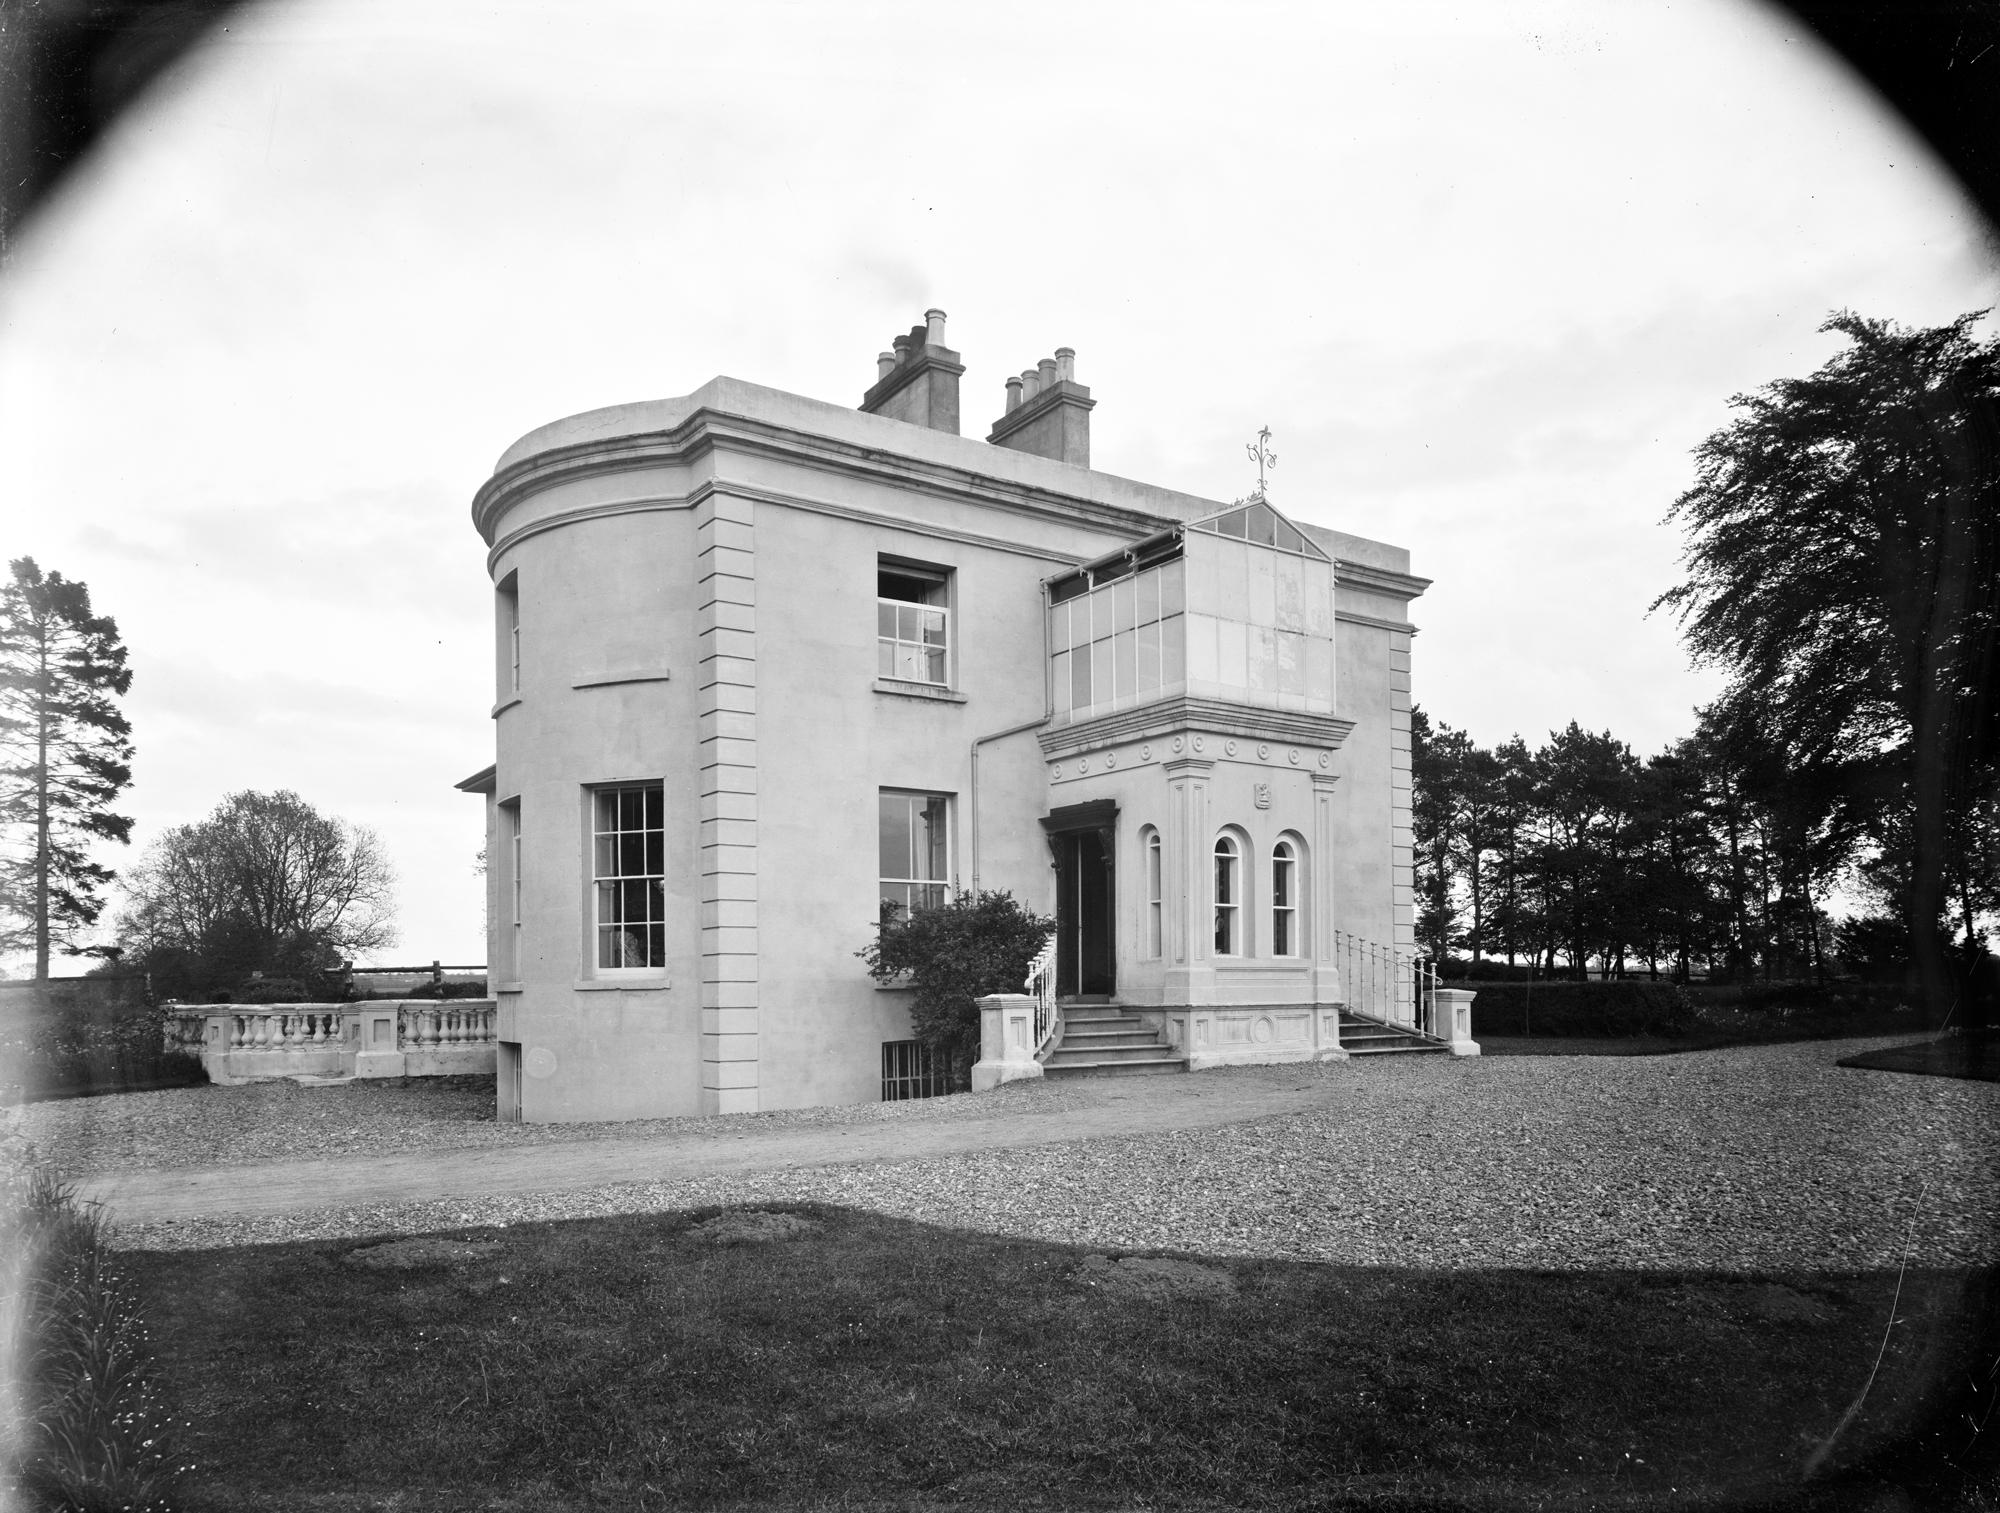 Mansion near Navan, Co Meath - is Boyne View House